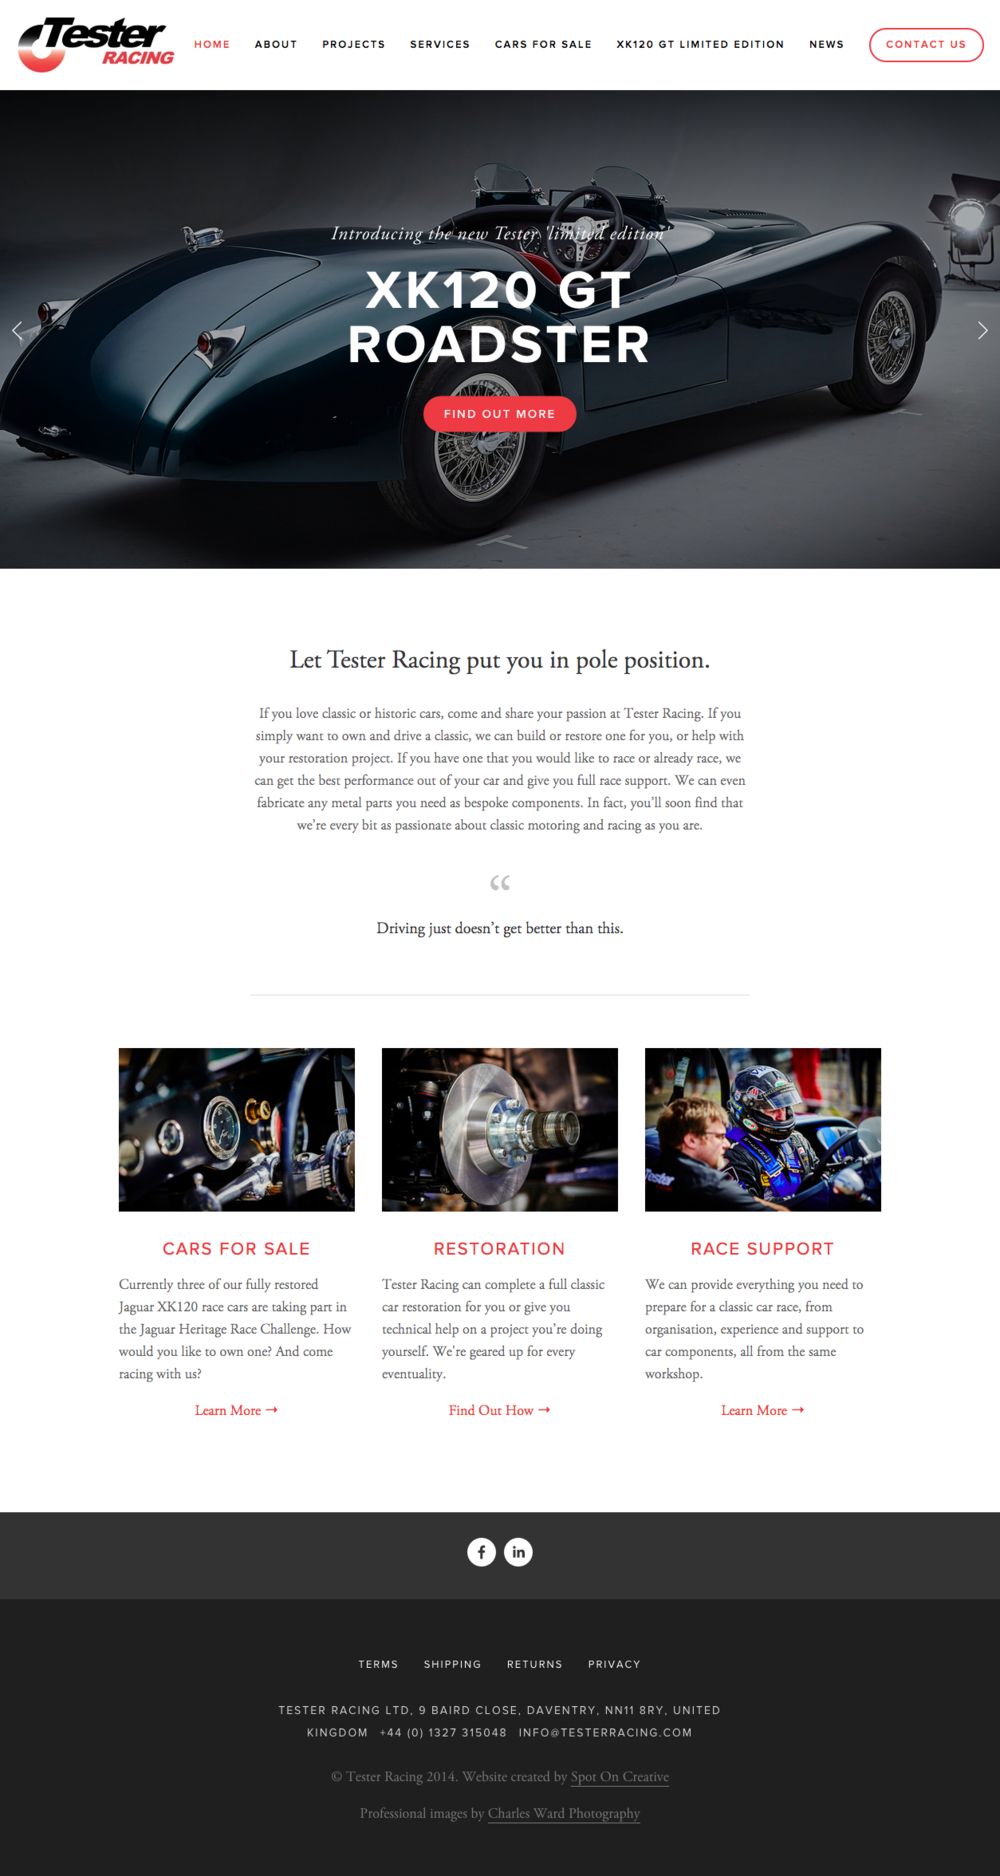 Tester Racing - Home3.png